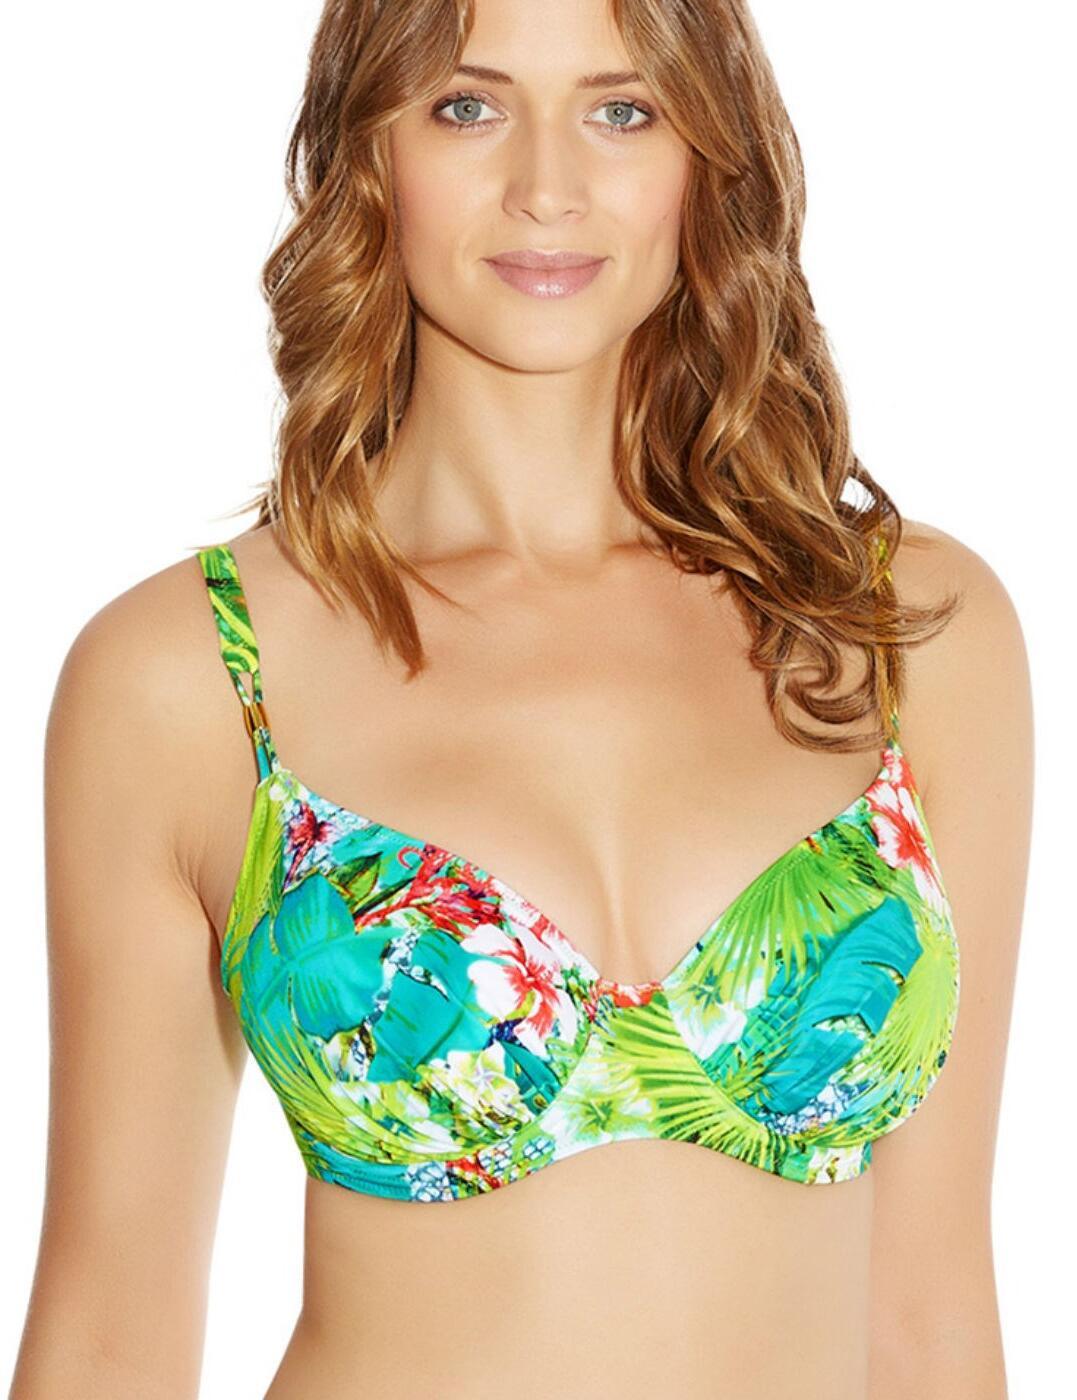 6056 Fantasie Antigua Full Cup Bikini Top - 6056 Full Cup Top